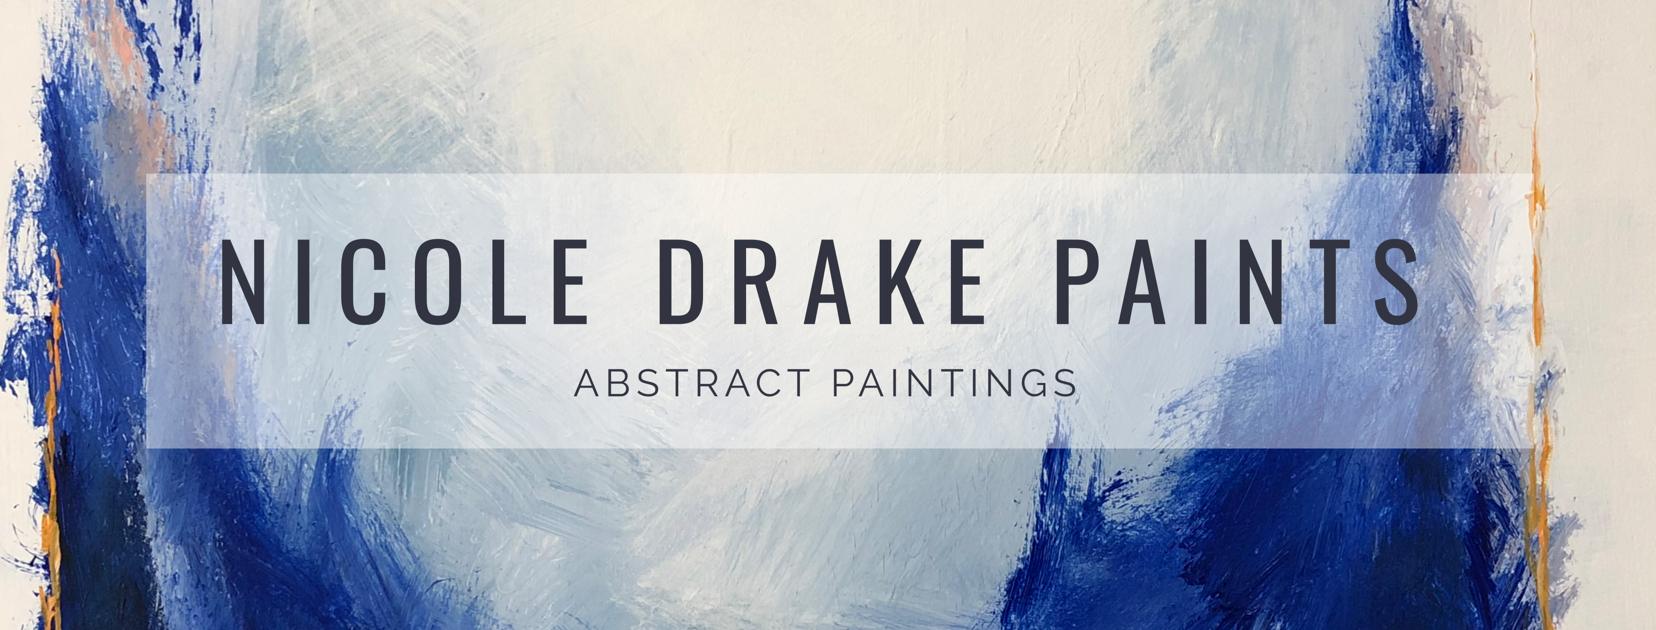 Nicole Drake Paints